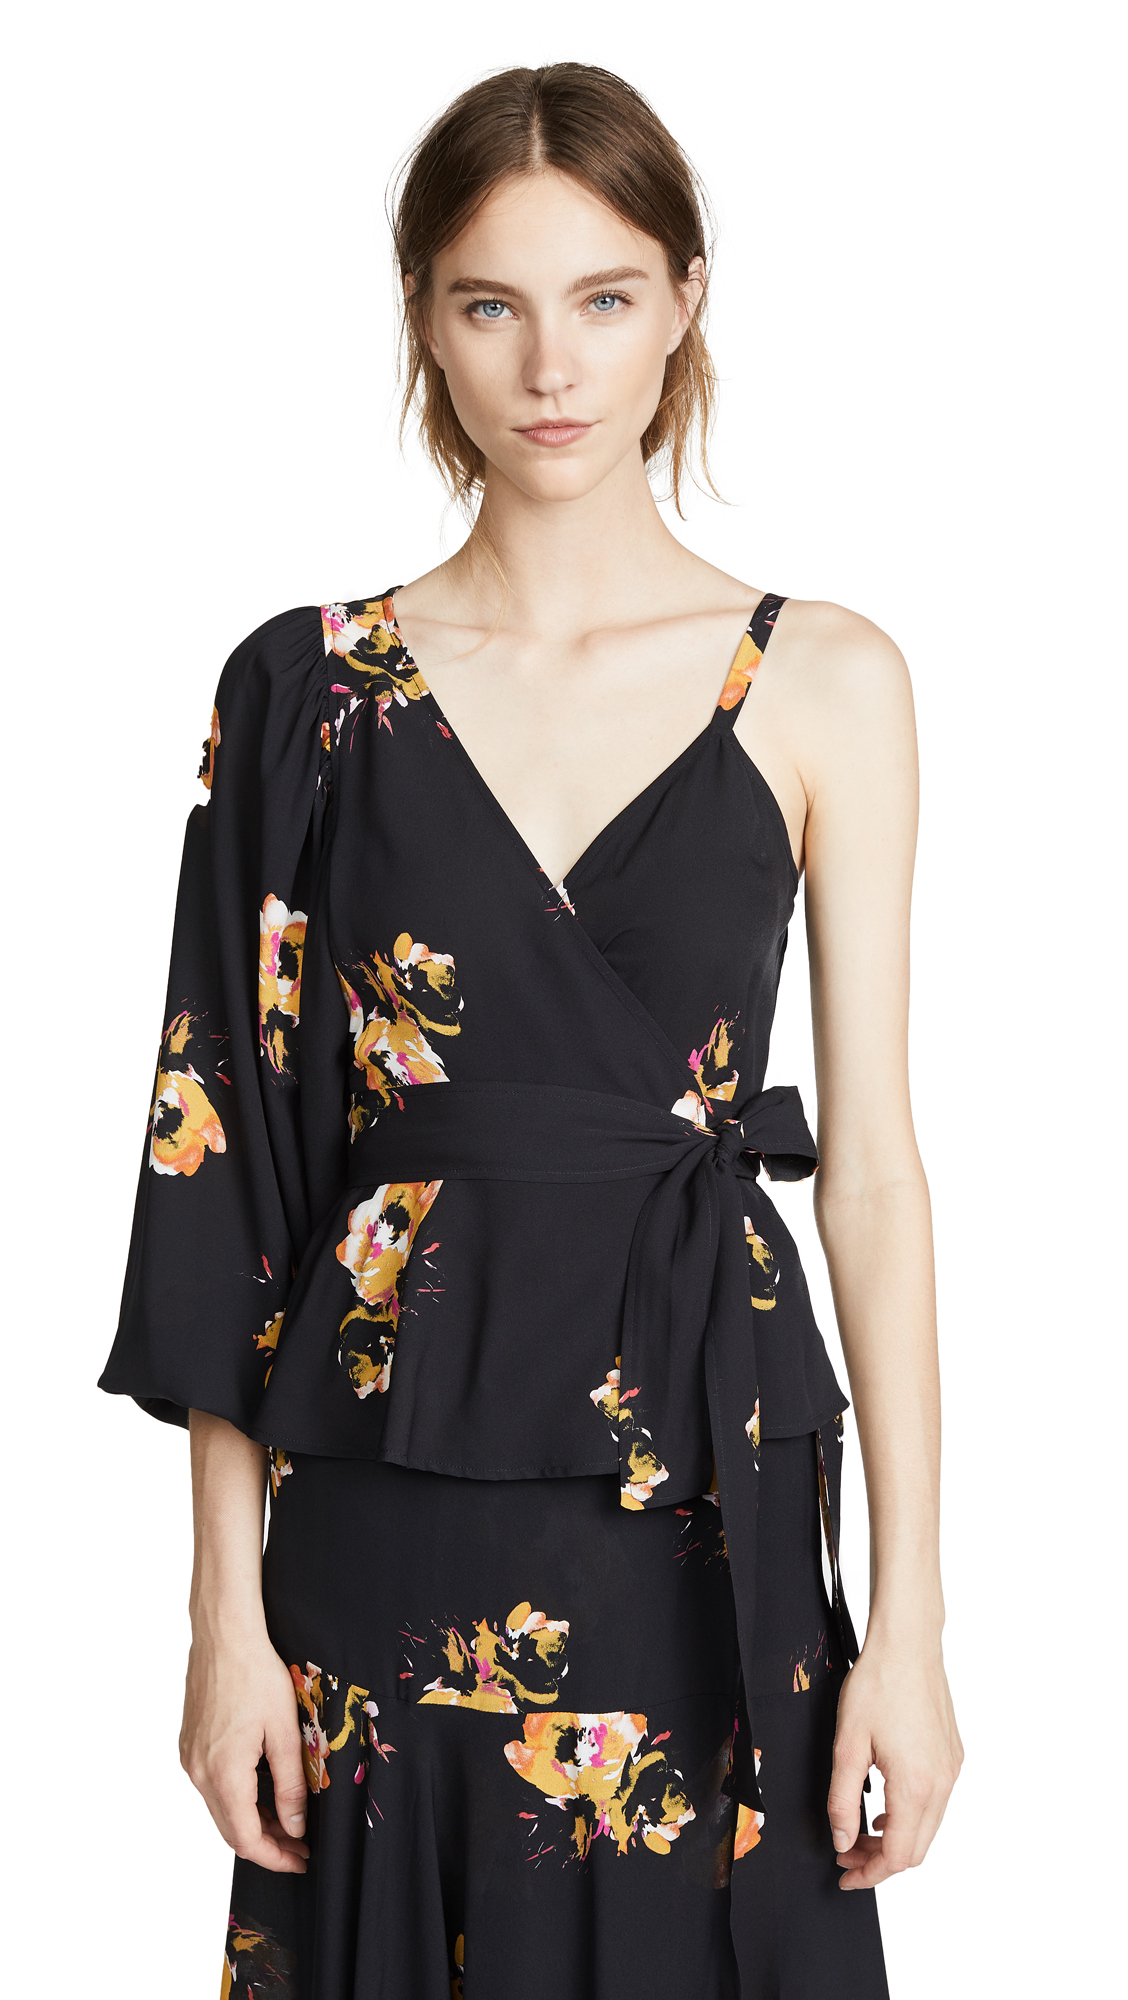 Mickalene Top in Black,Floral A.L.C.